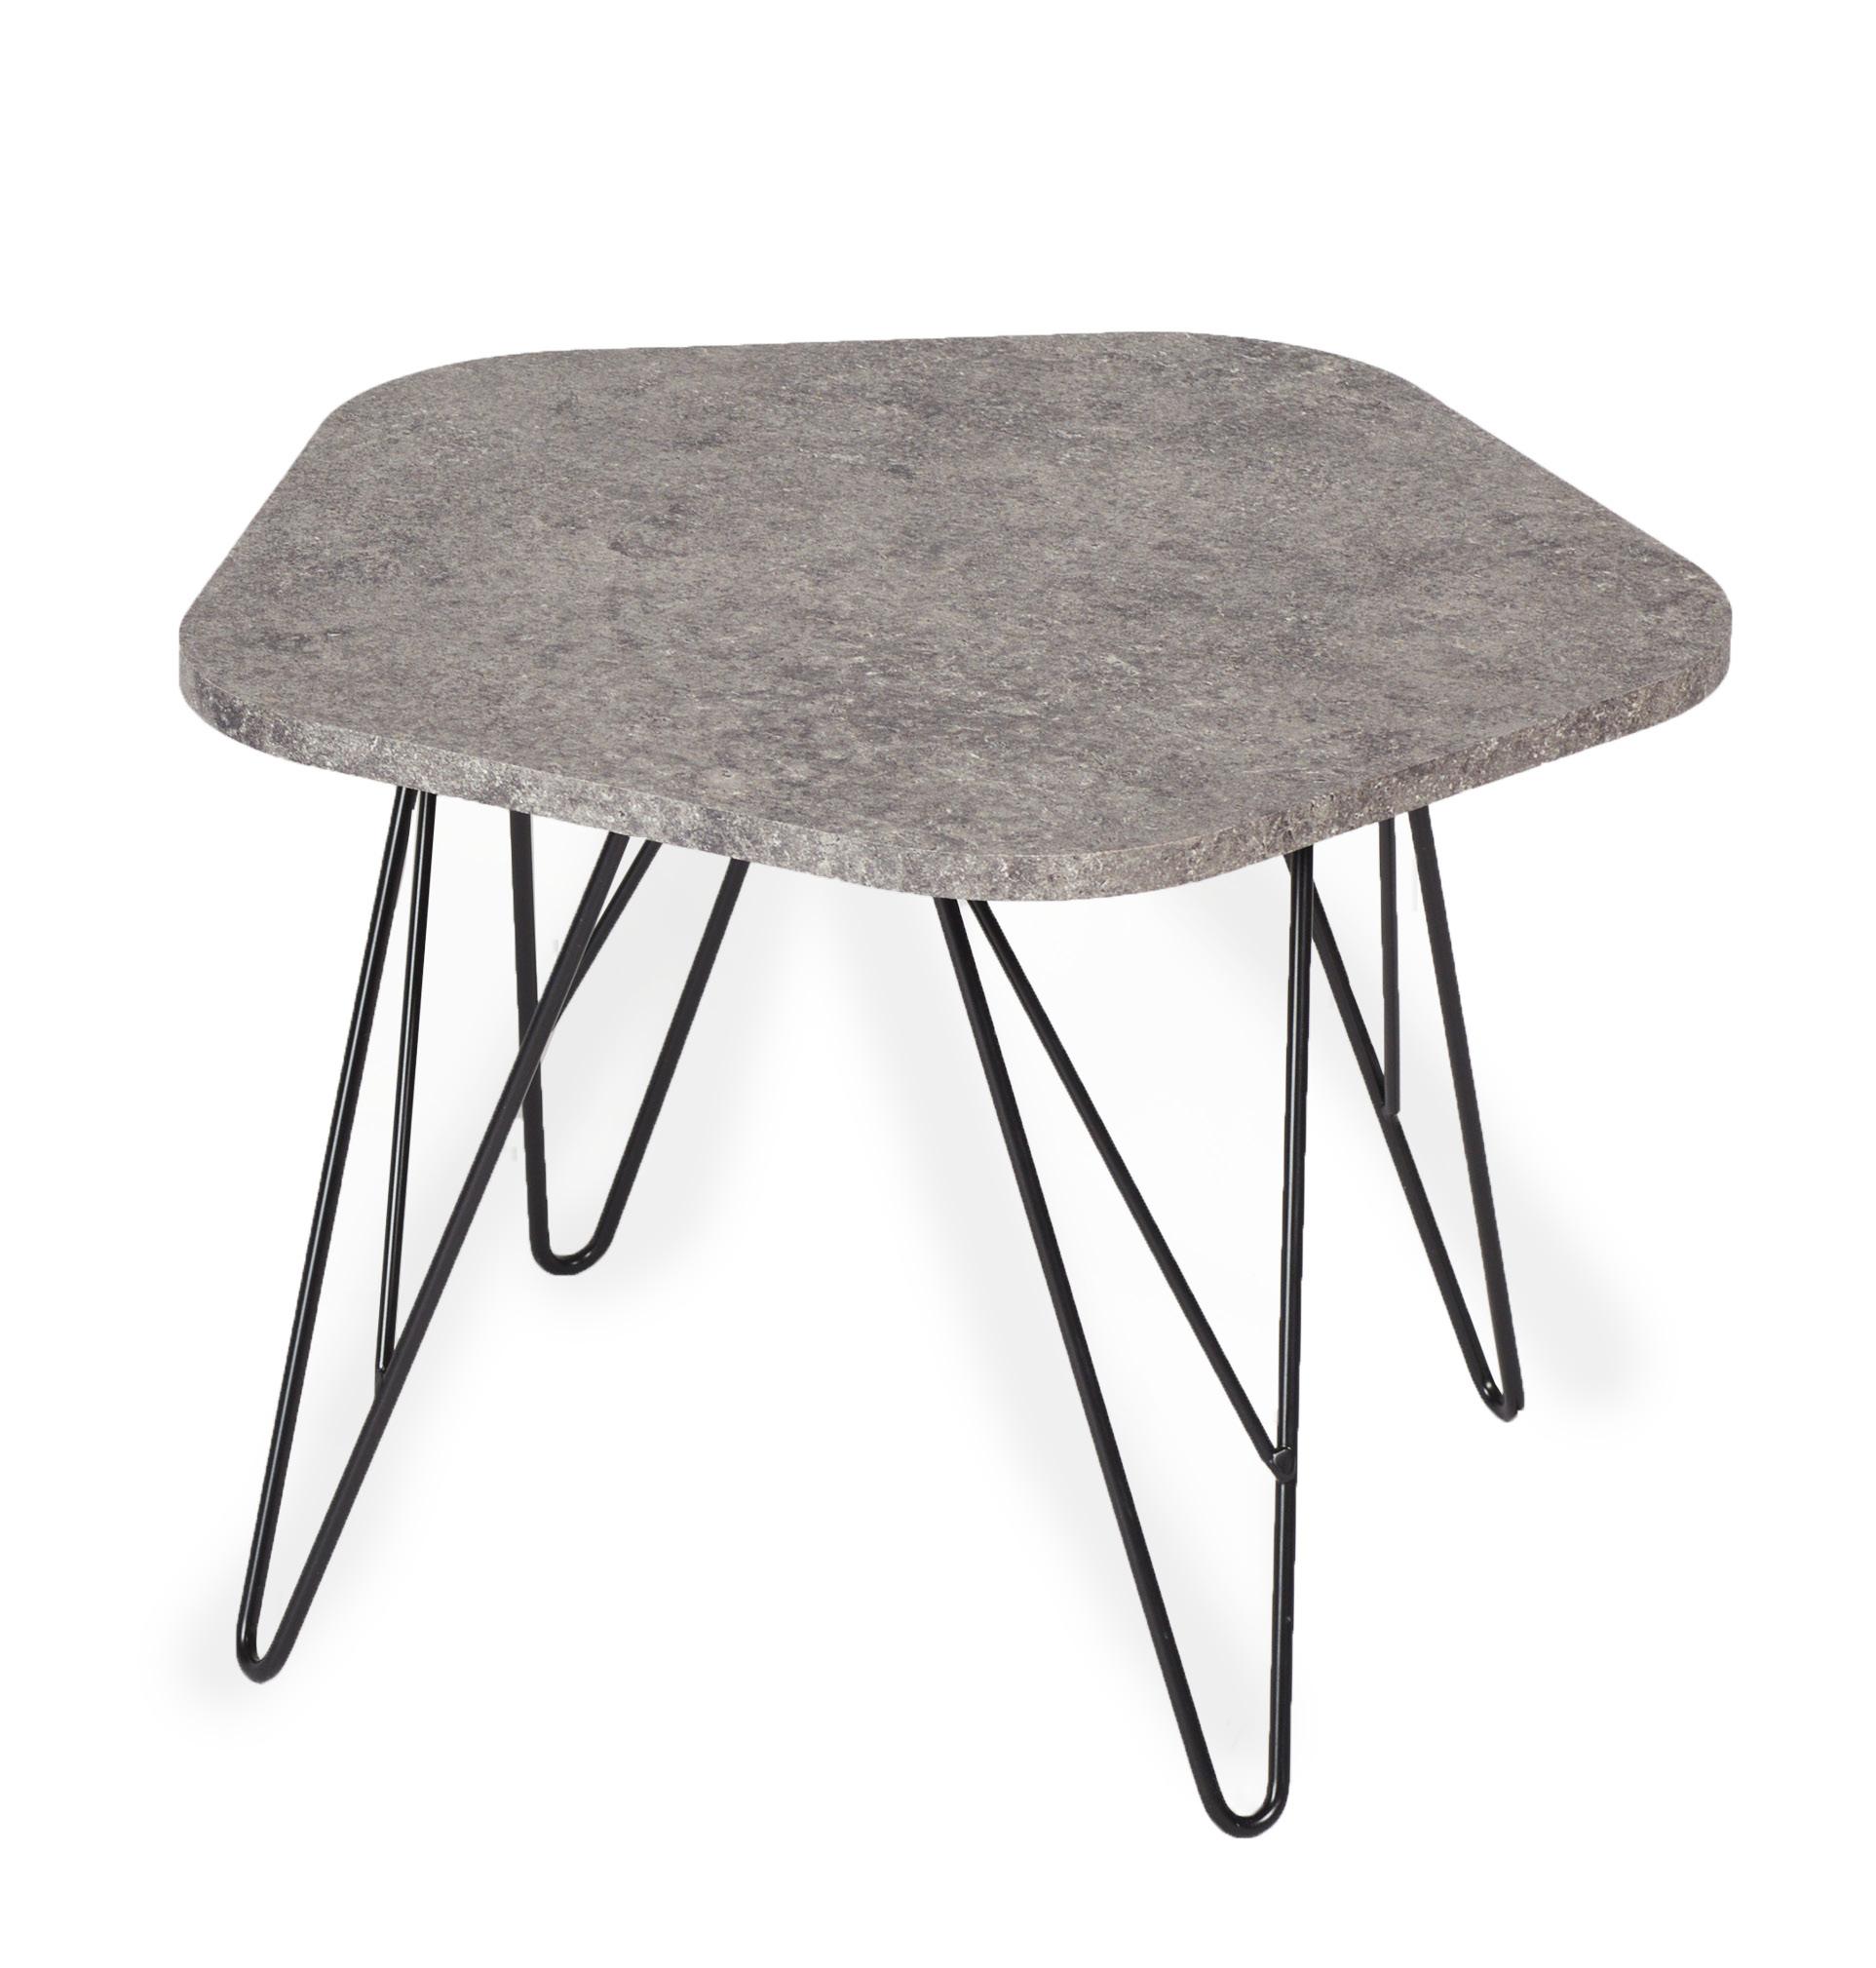 Kiwi5 sohvapöytä 60 x 60 cm, Tenstar